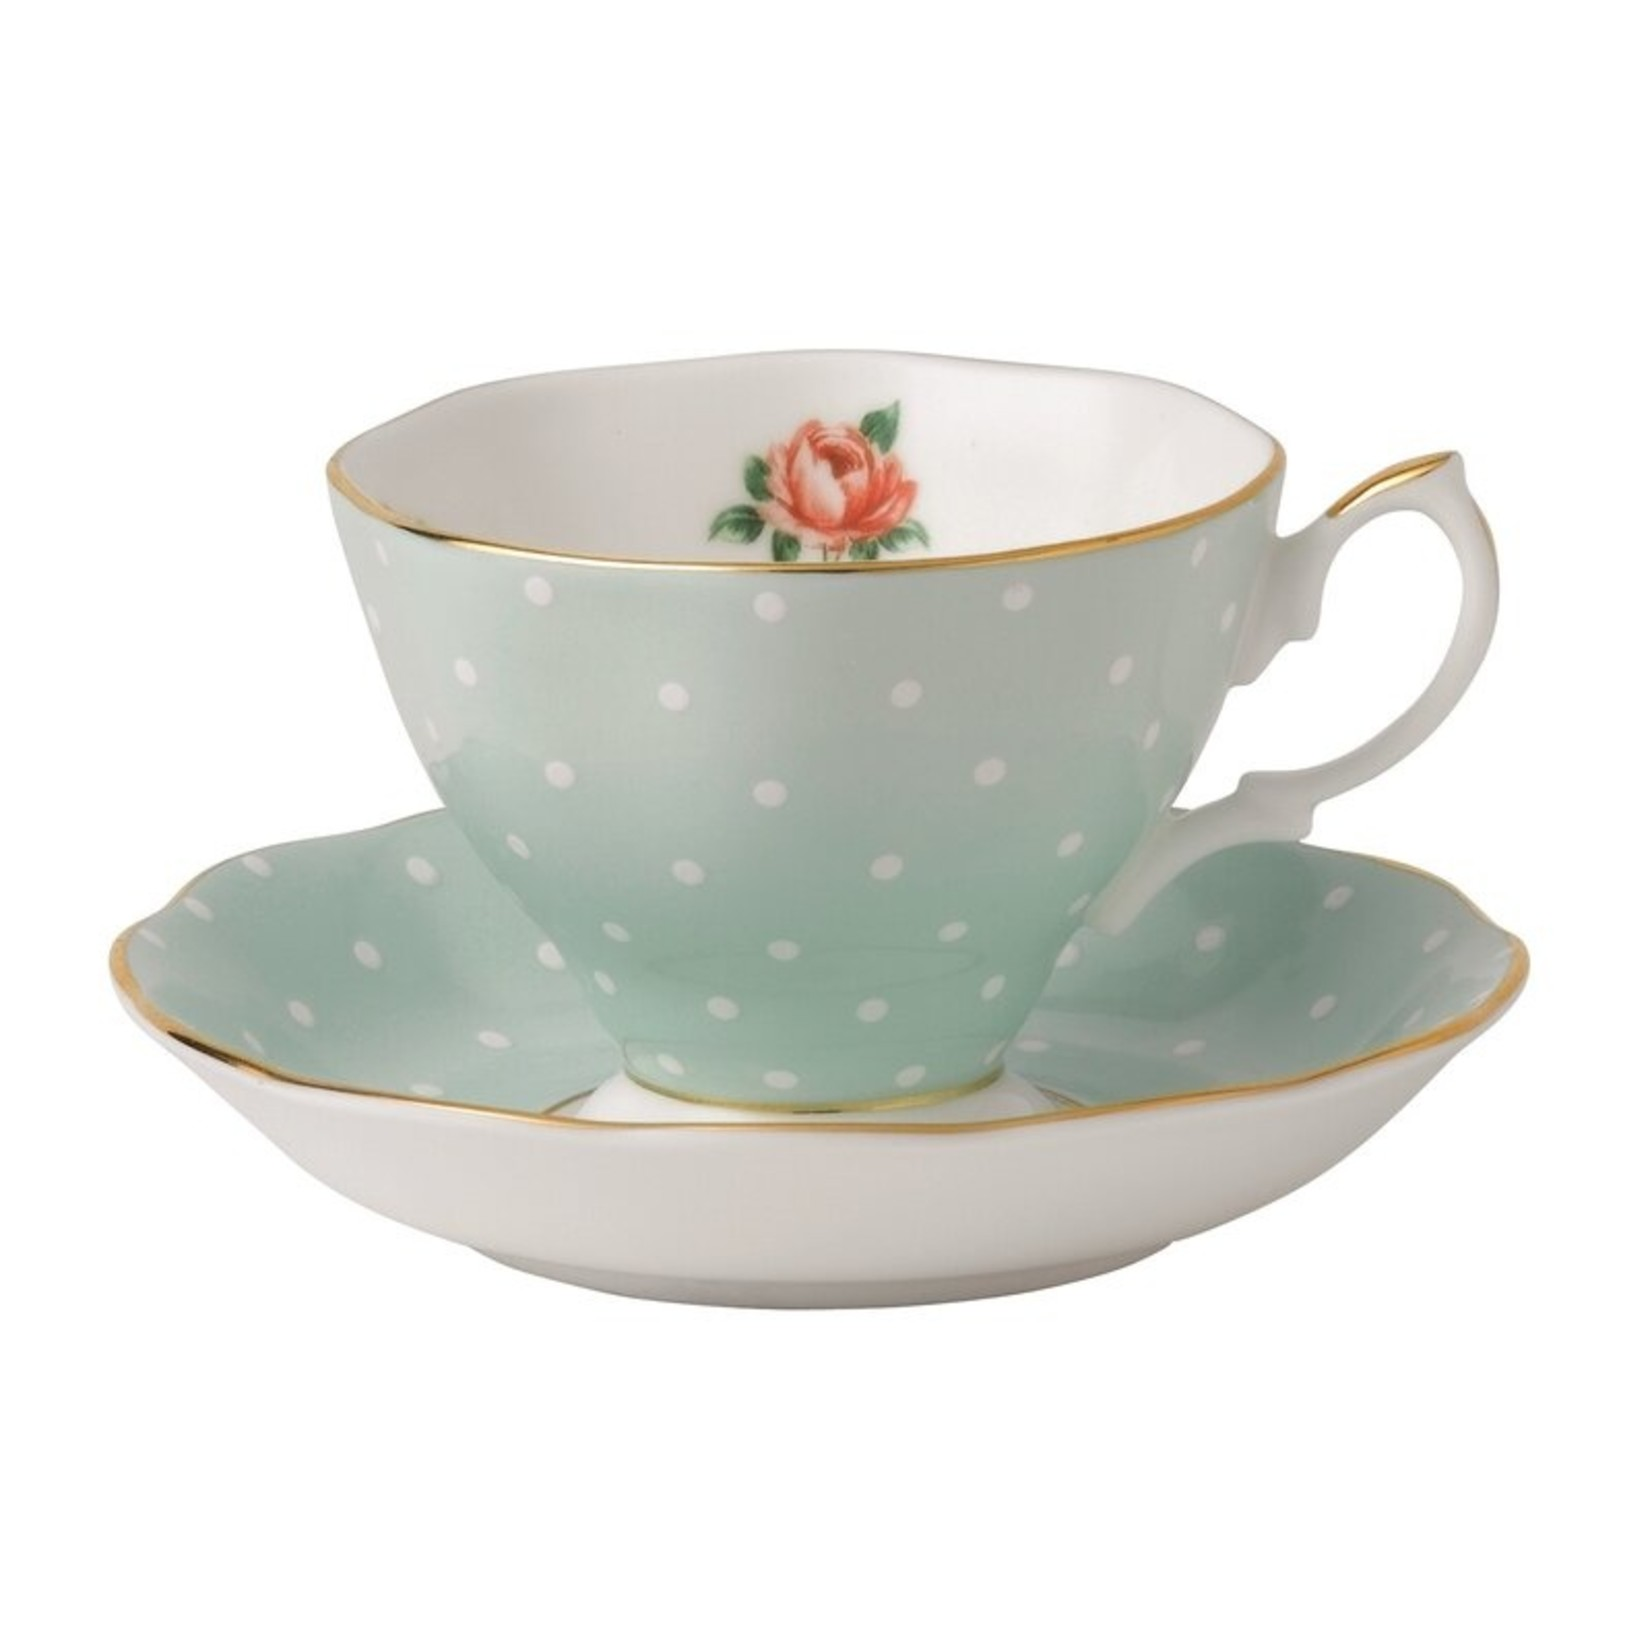 *Polka Rose Formal Bone China Teacup & Saucer